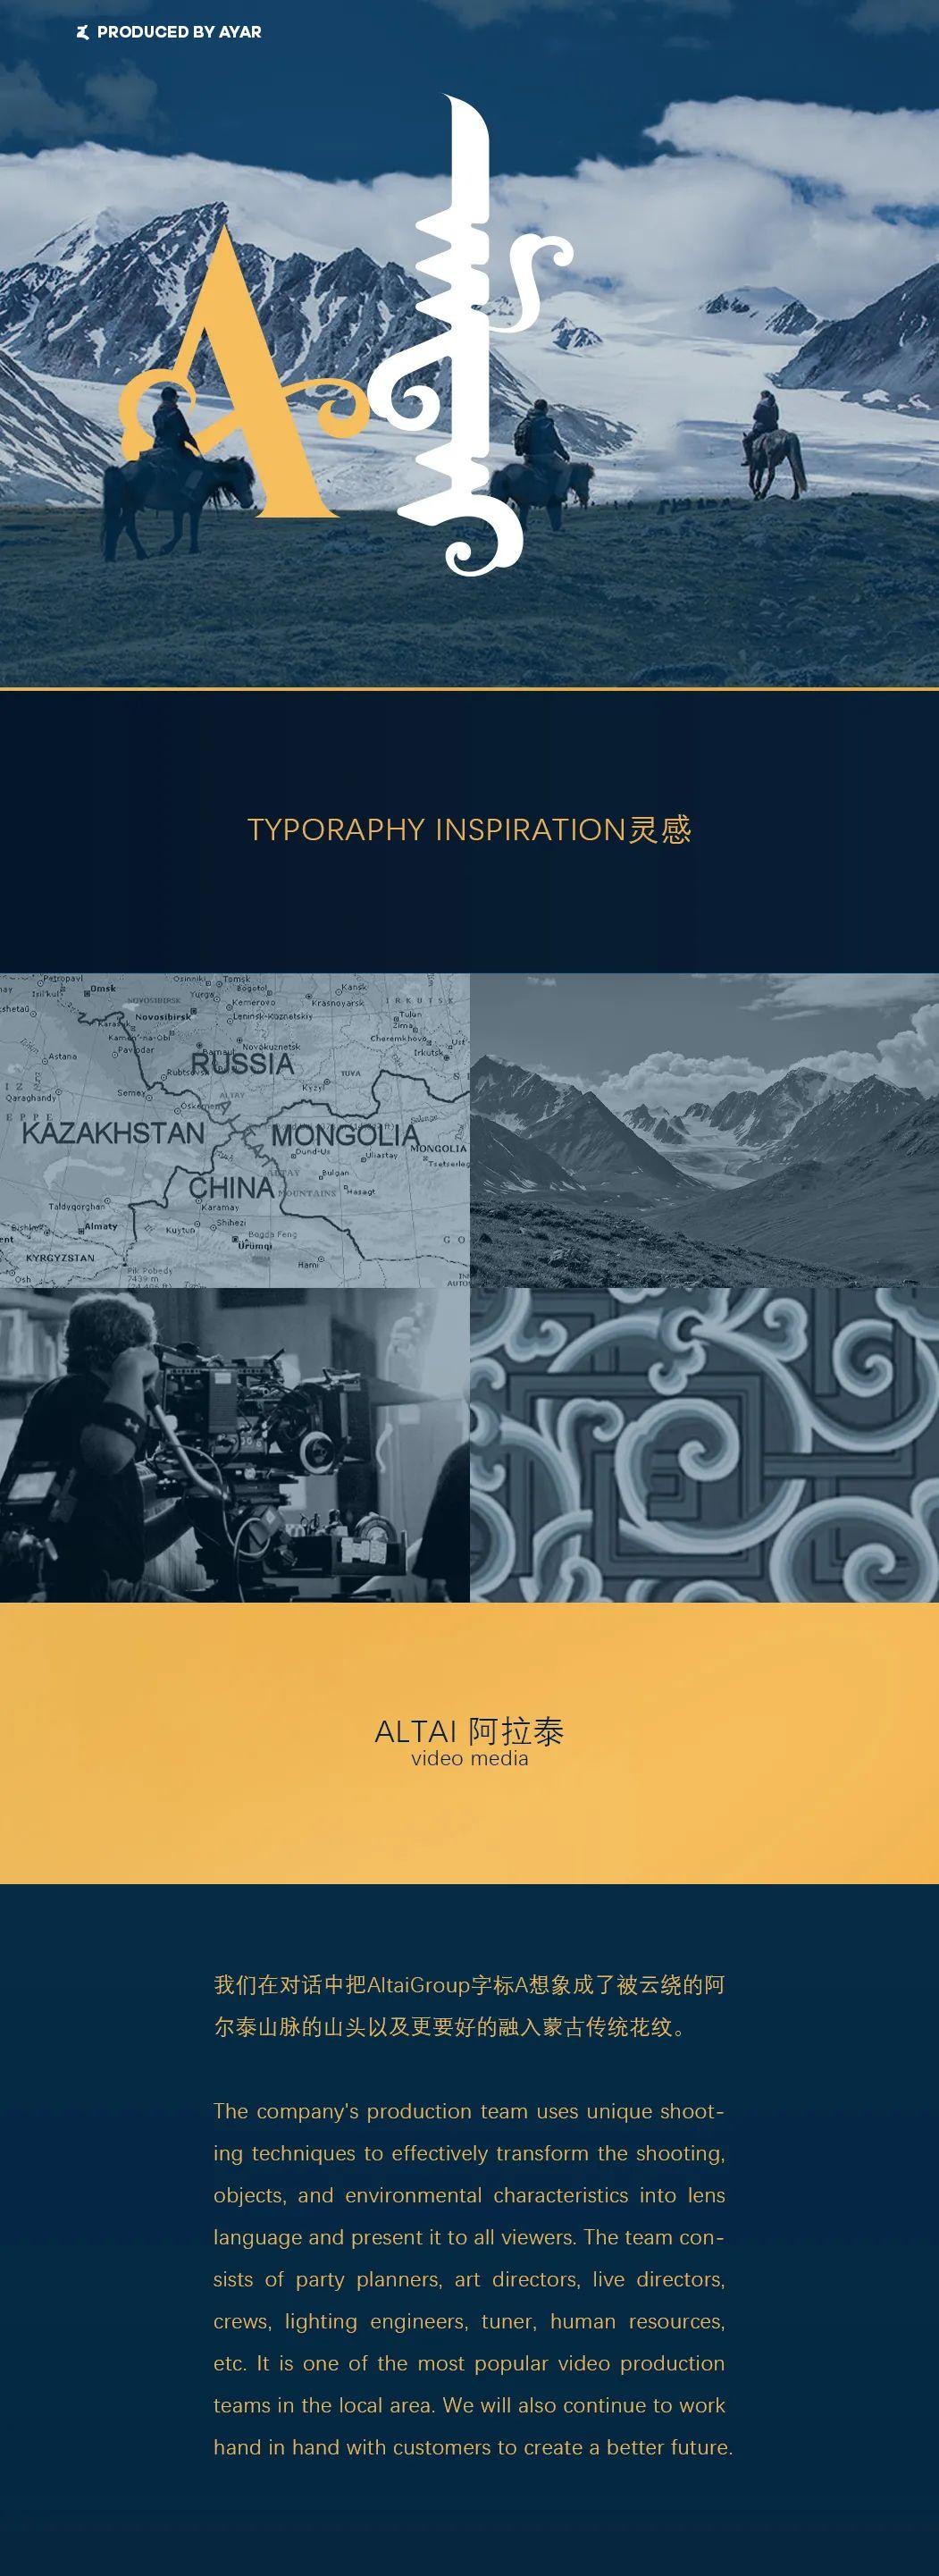 Altai Logo字标的蒙古文和蒙古花纹